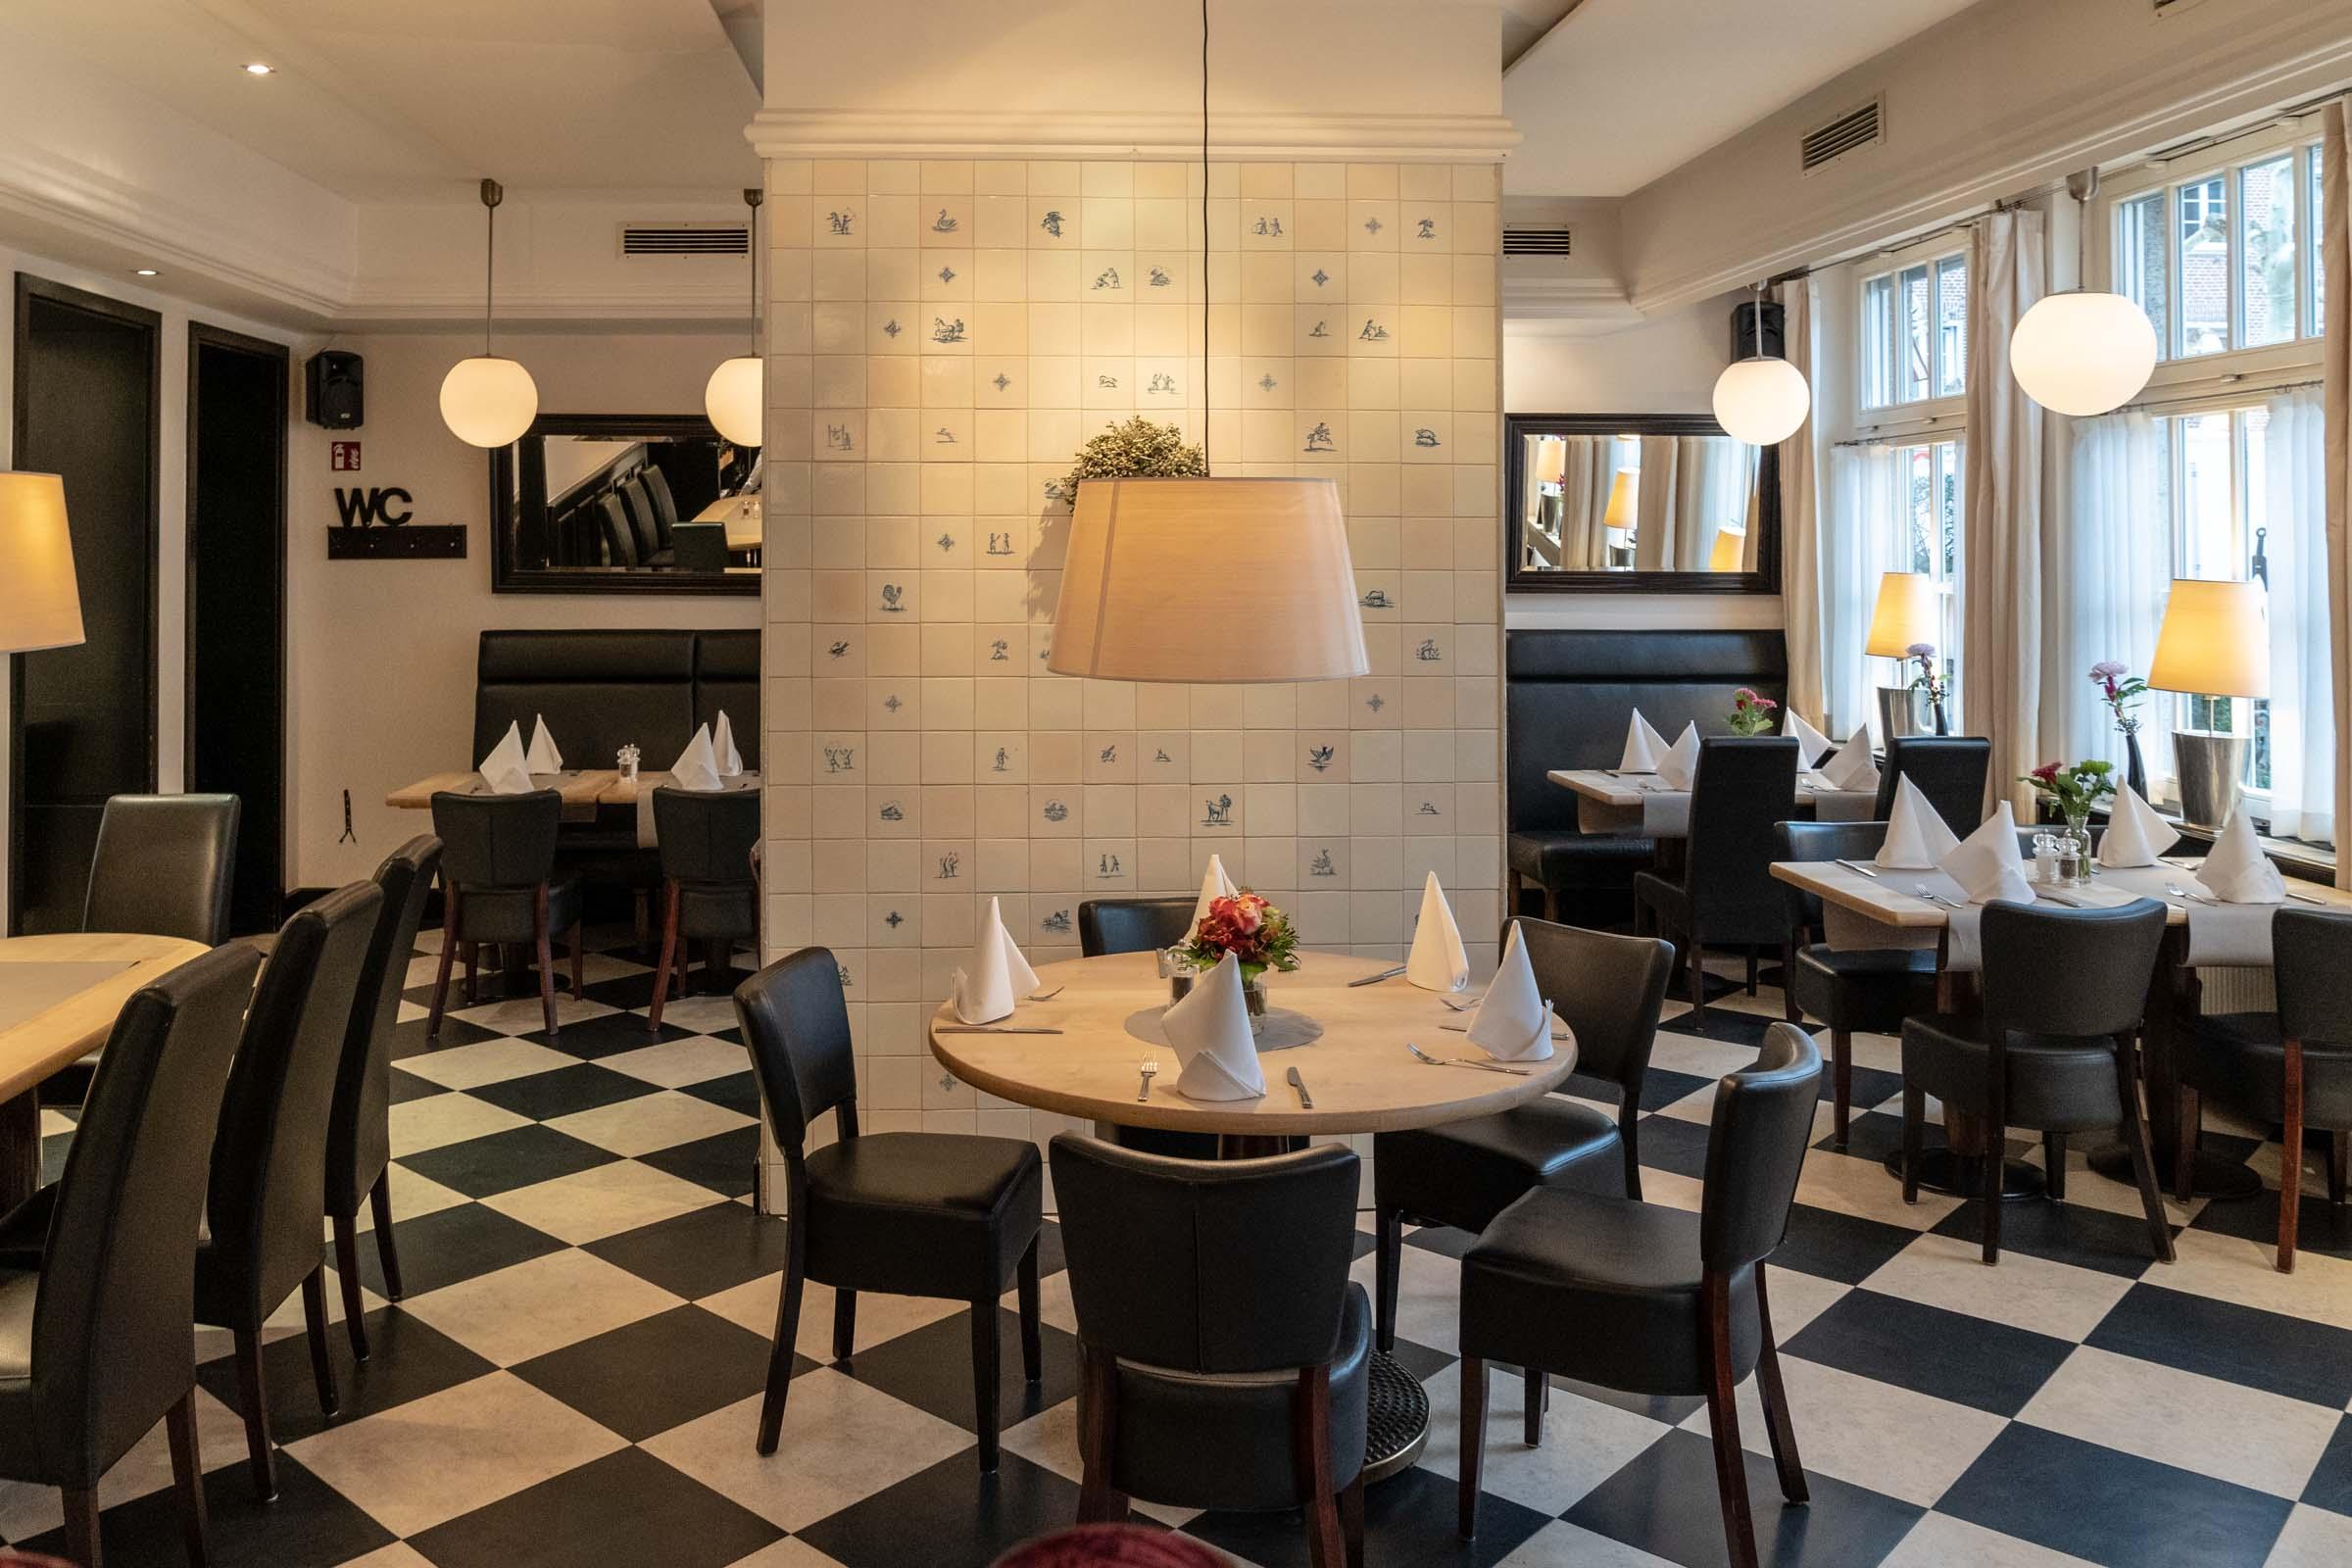 Hotel Werk 2 Bocholt Restaurant